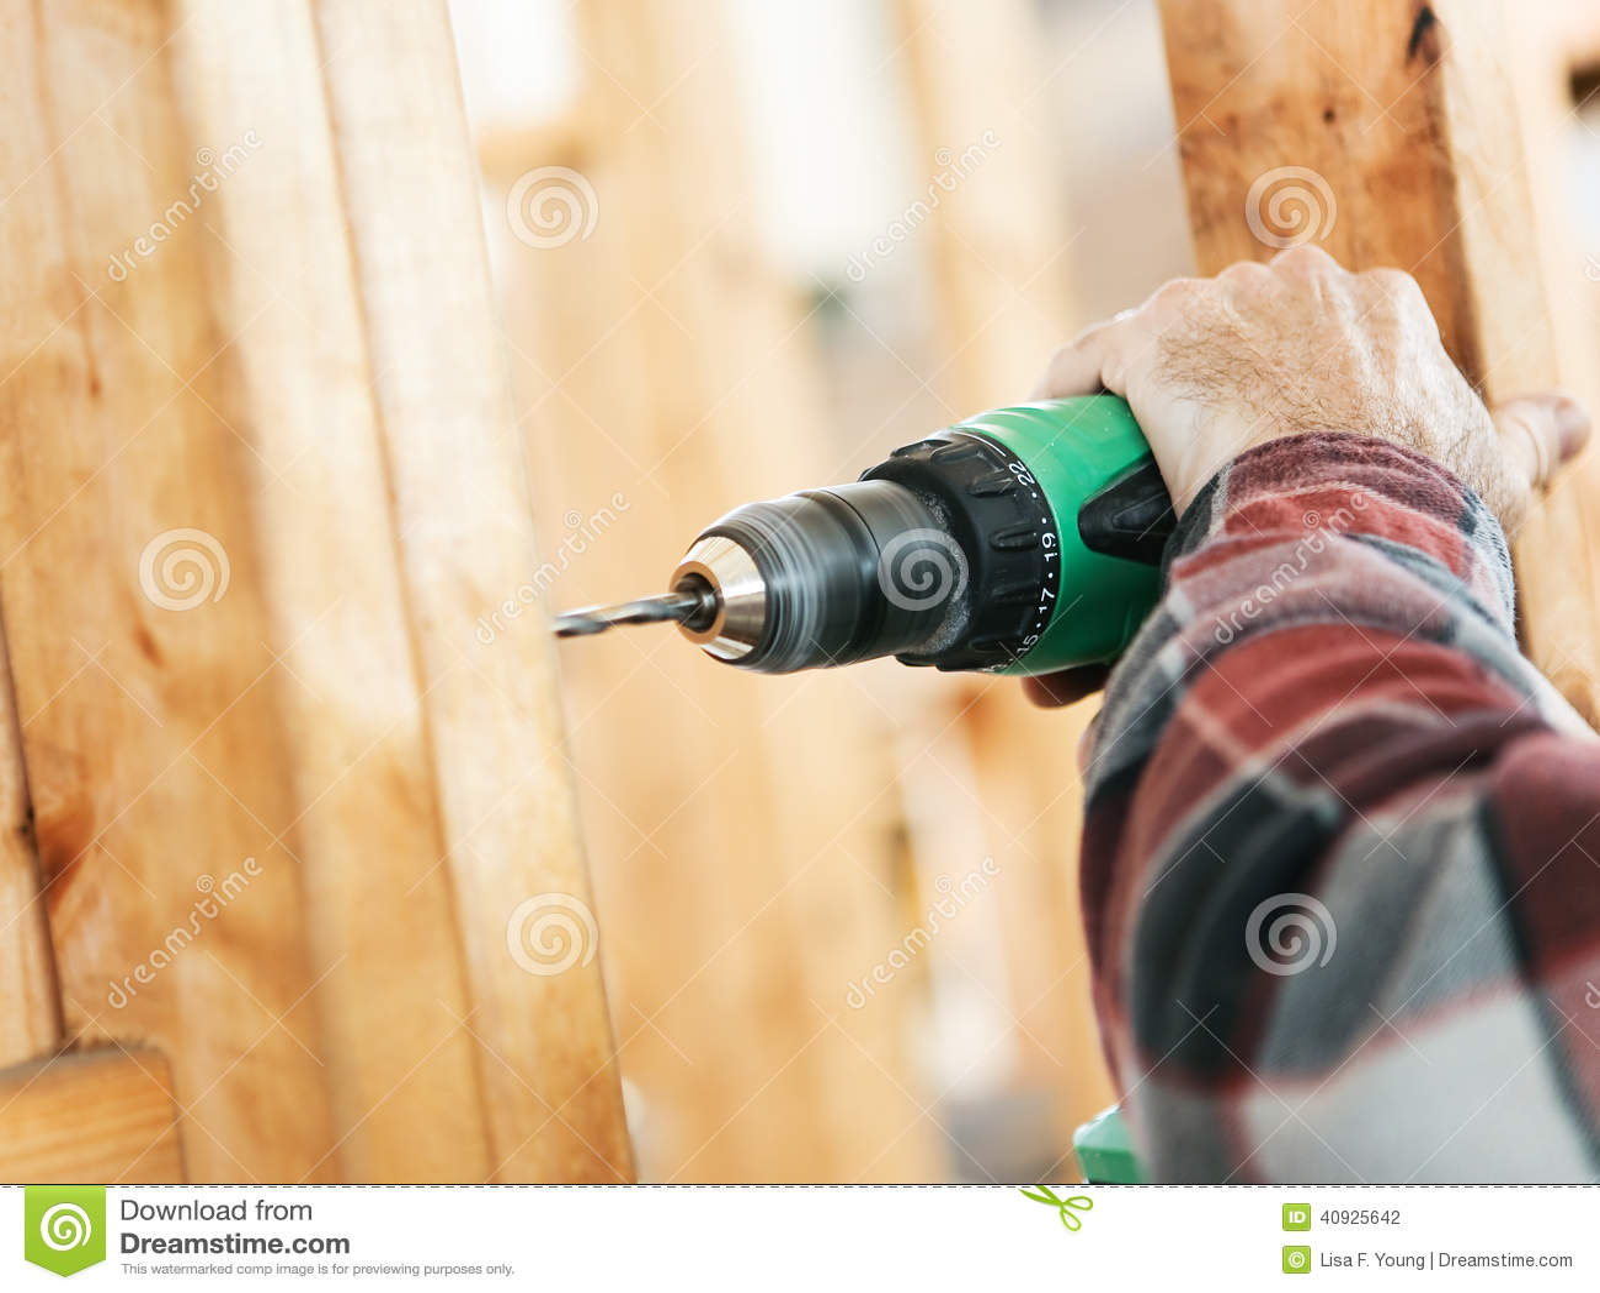 Baustelle - bohrend